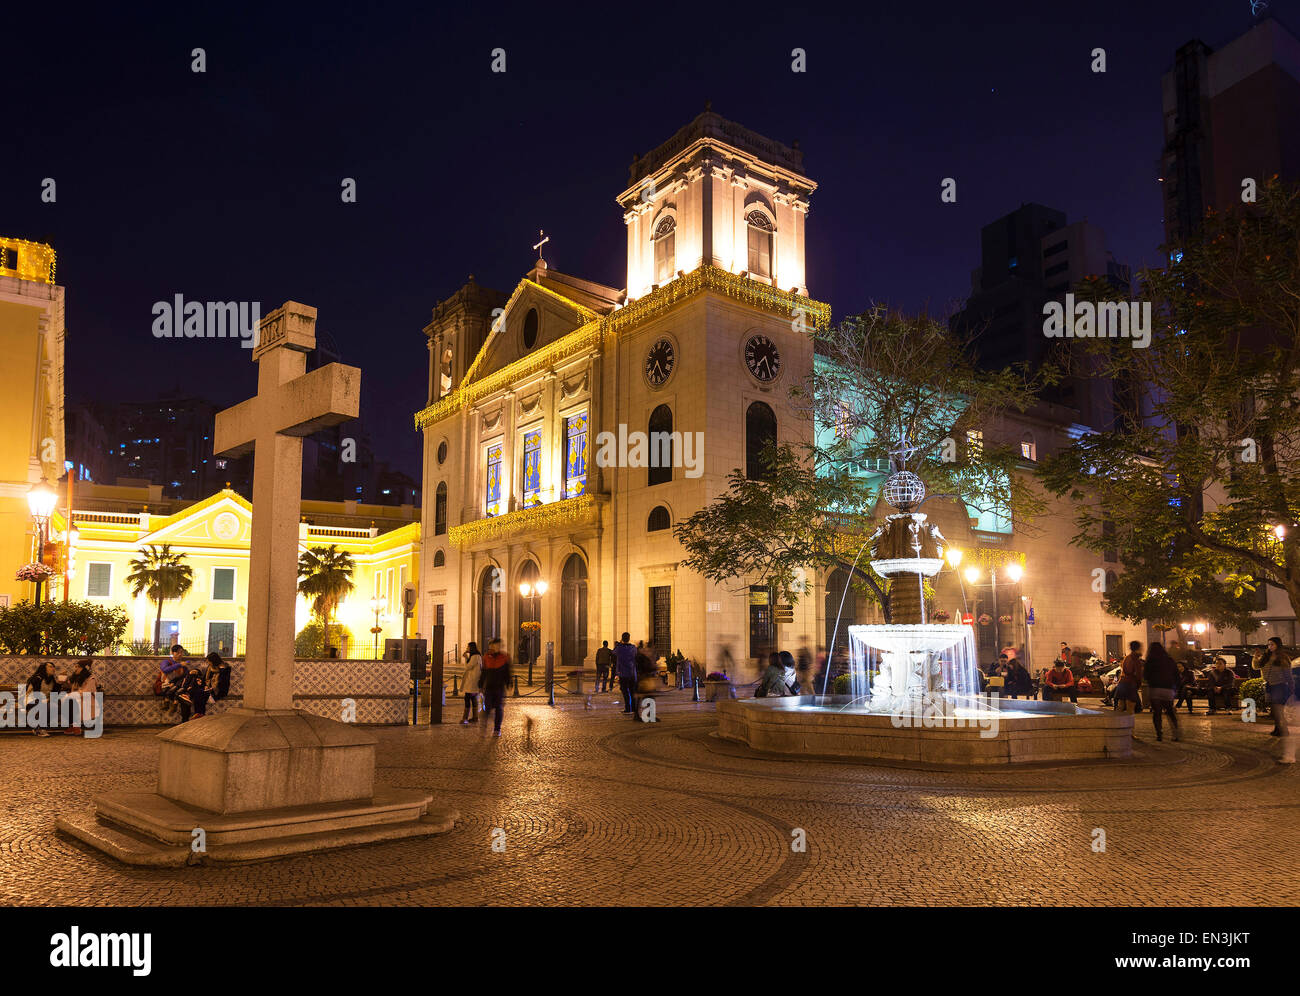 Antigua iglesia colonial portugués en la plaza de macao macao china Imagen De Stock